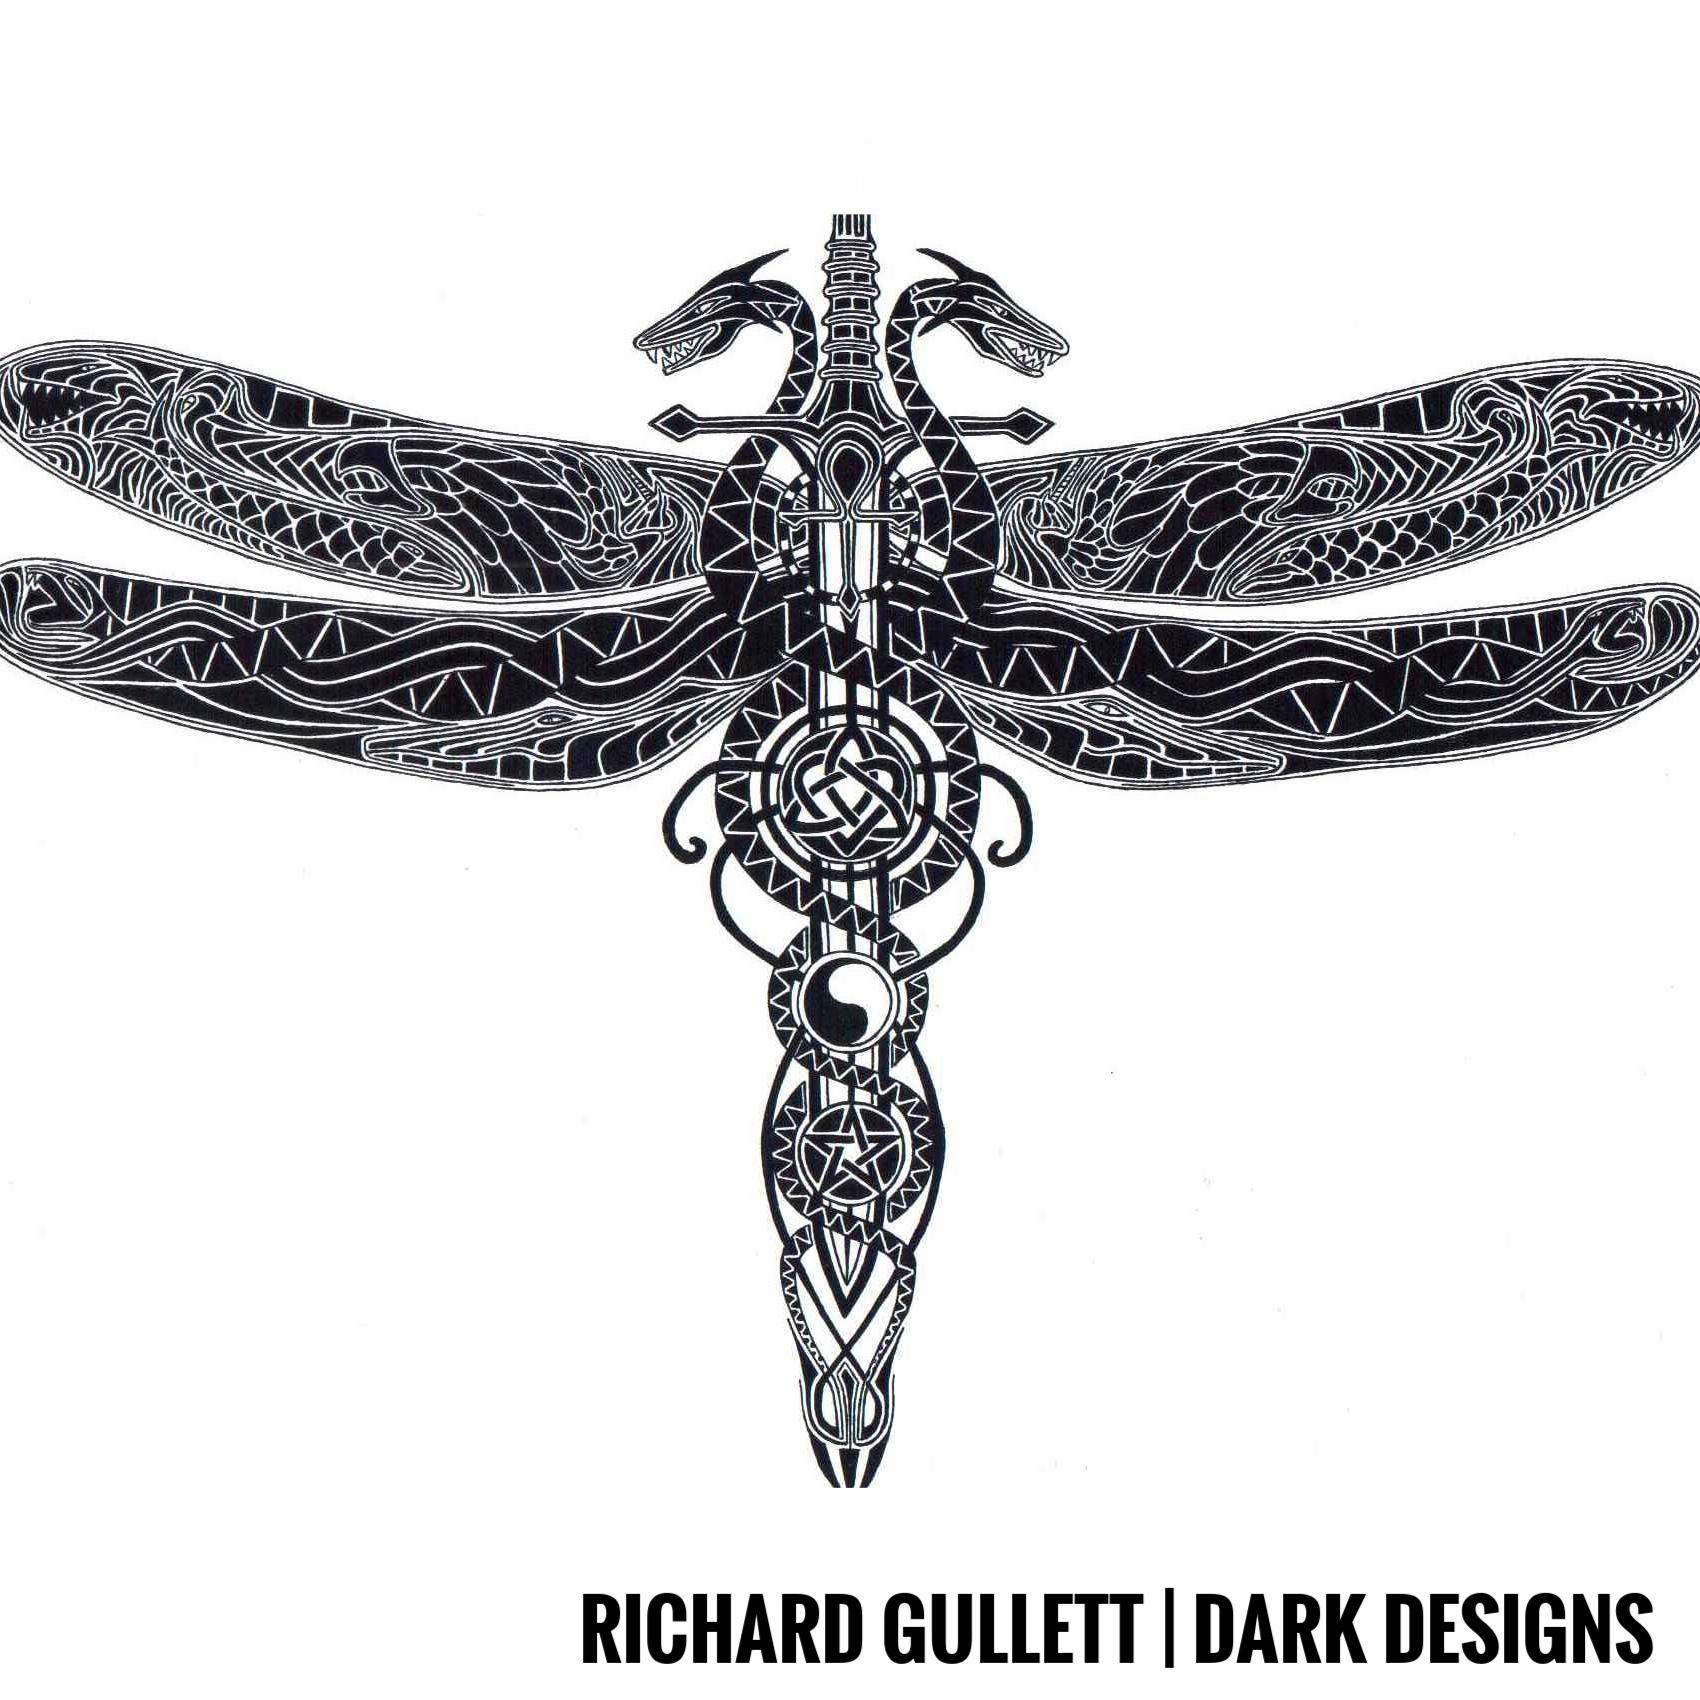 Richard Gullett | Dark Designs